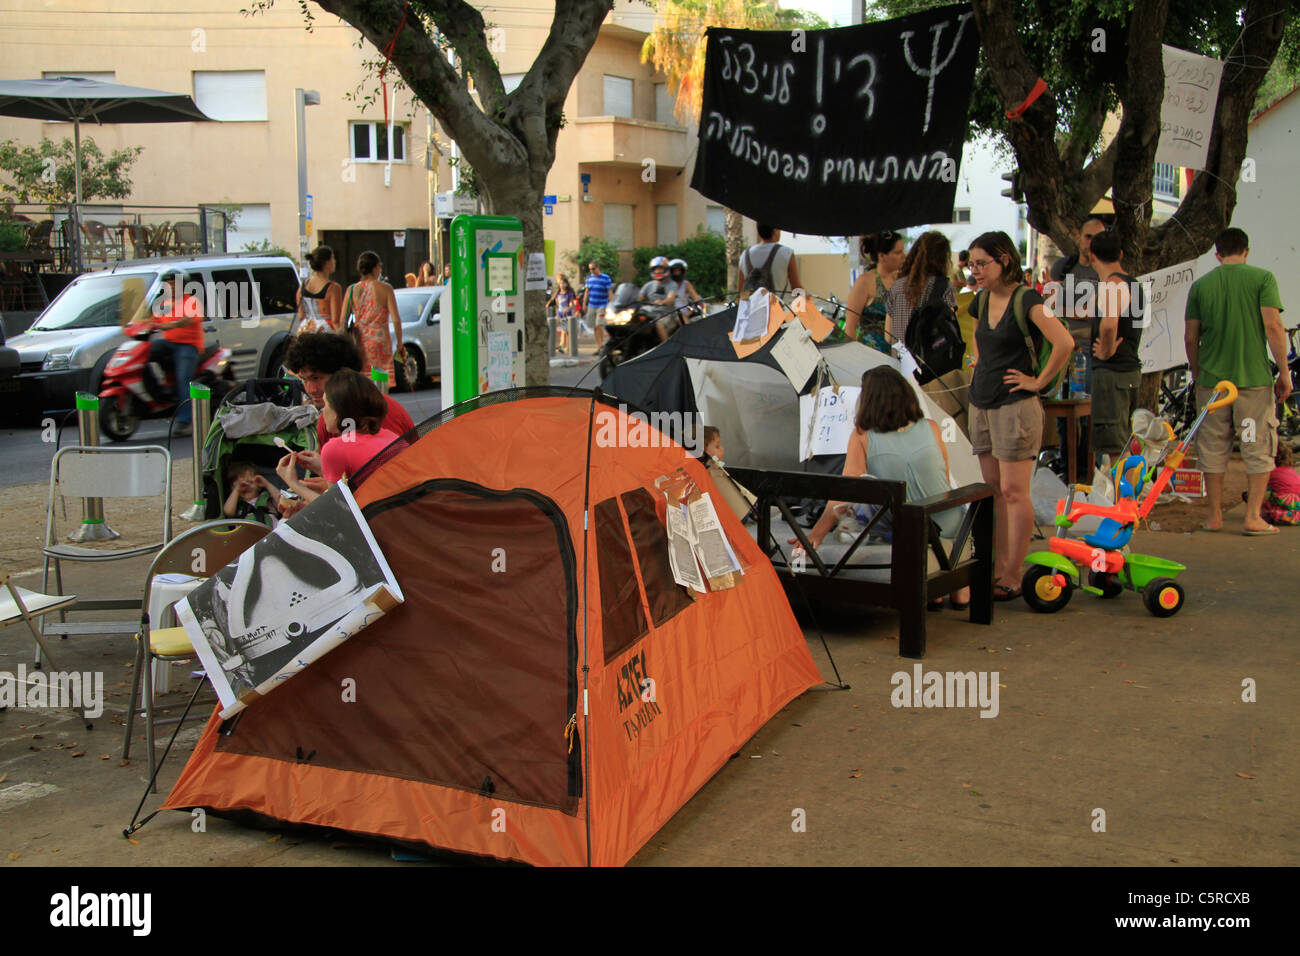 Israel, Tel Aviv, the Housing Protest in Rothschild Avenue - Stock Image